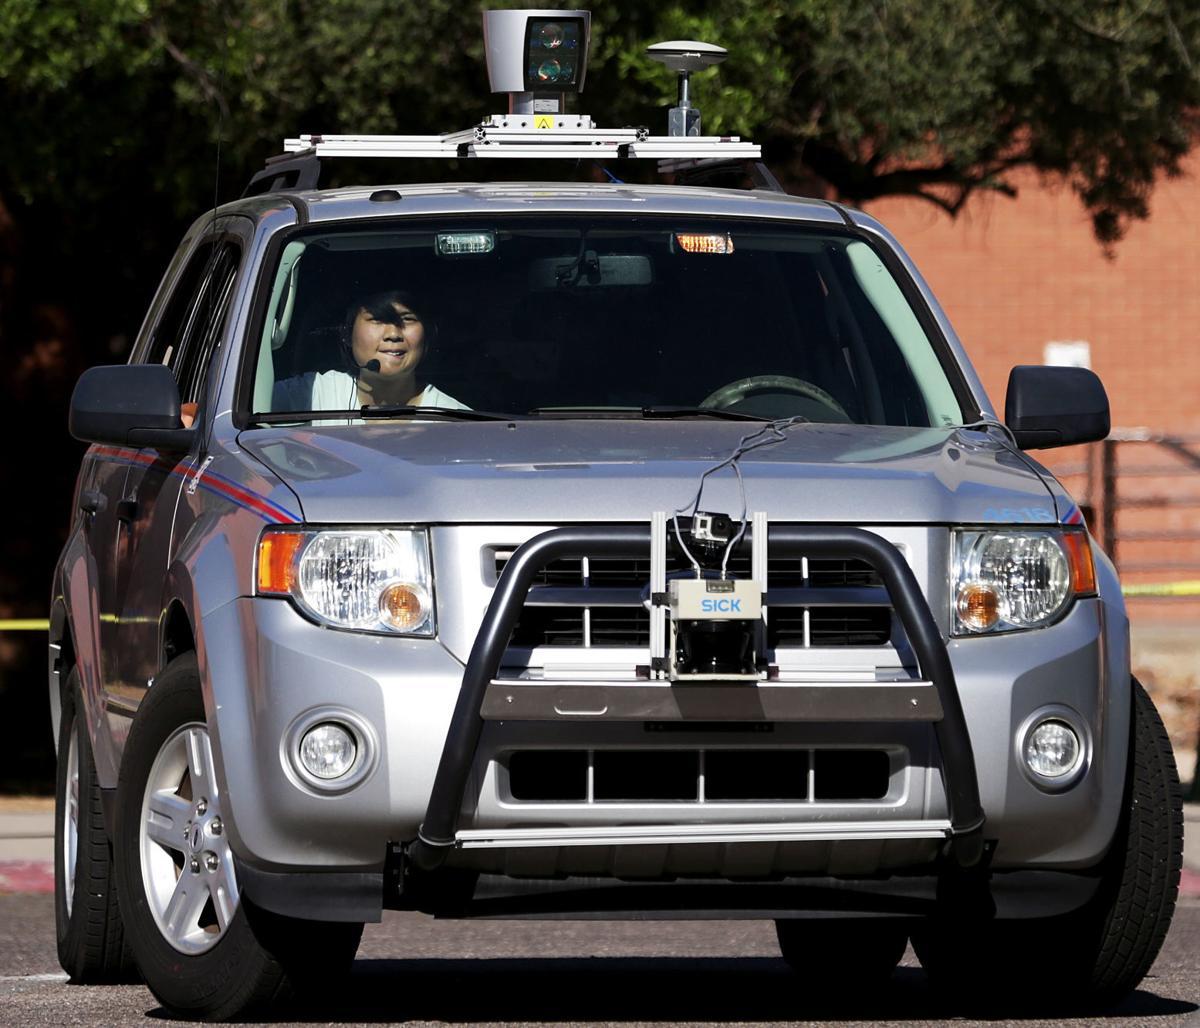 UA autonomous vehicle testing